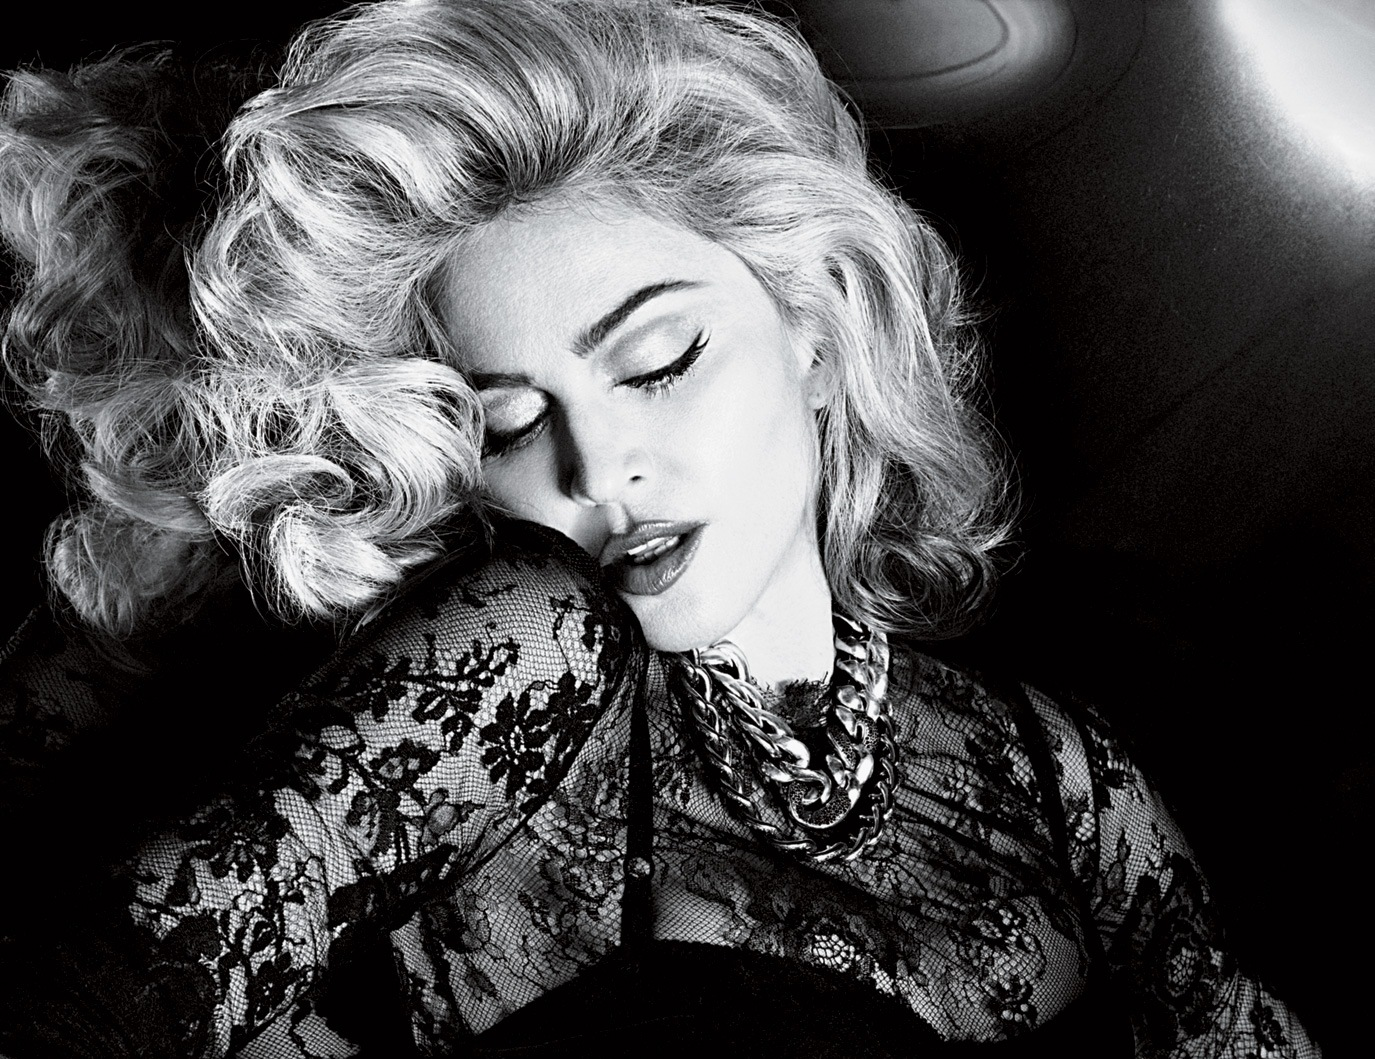 Madonna by Mert Alas & Marcus Piggott for Interview Magazine May 2010